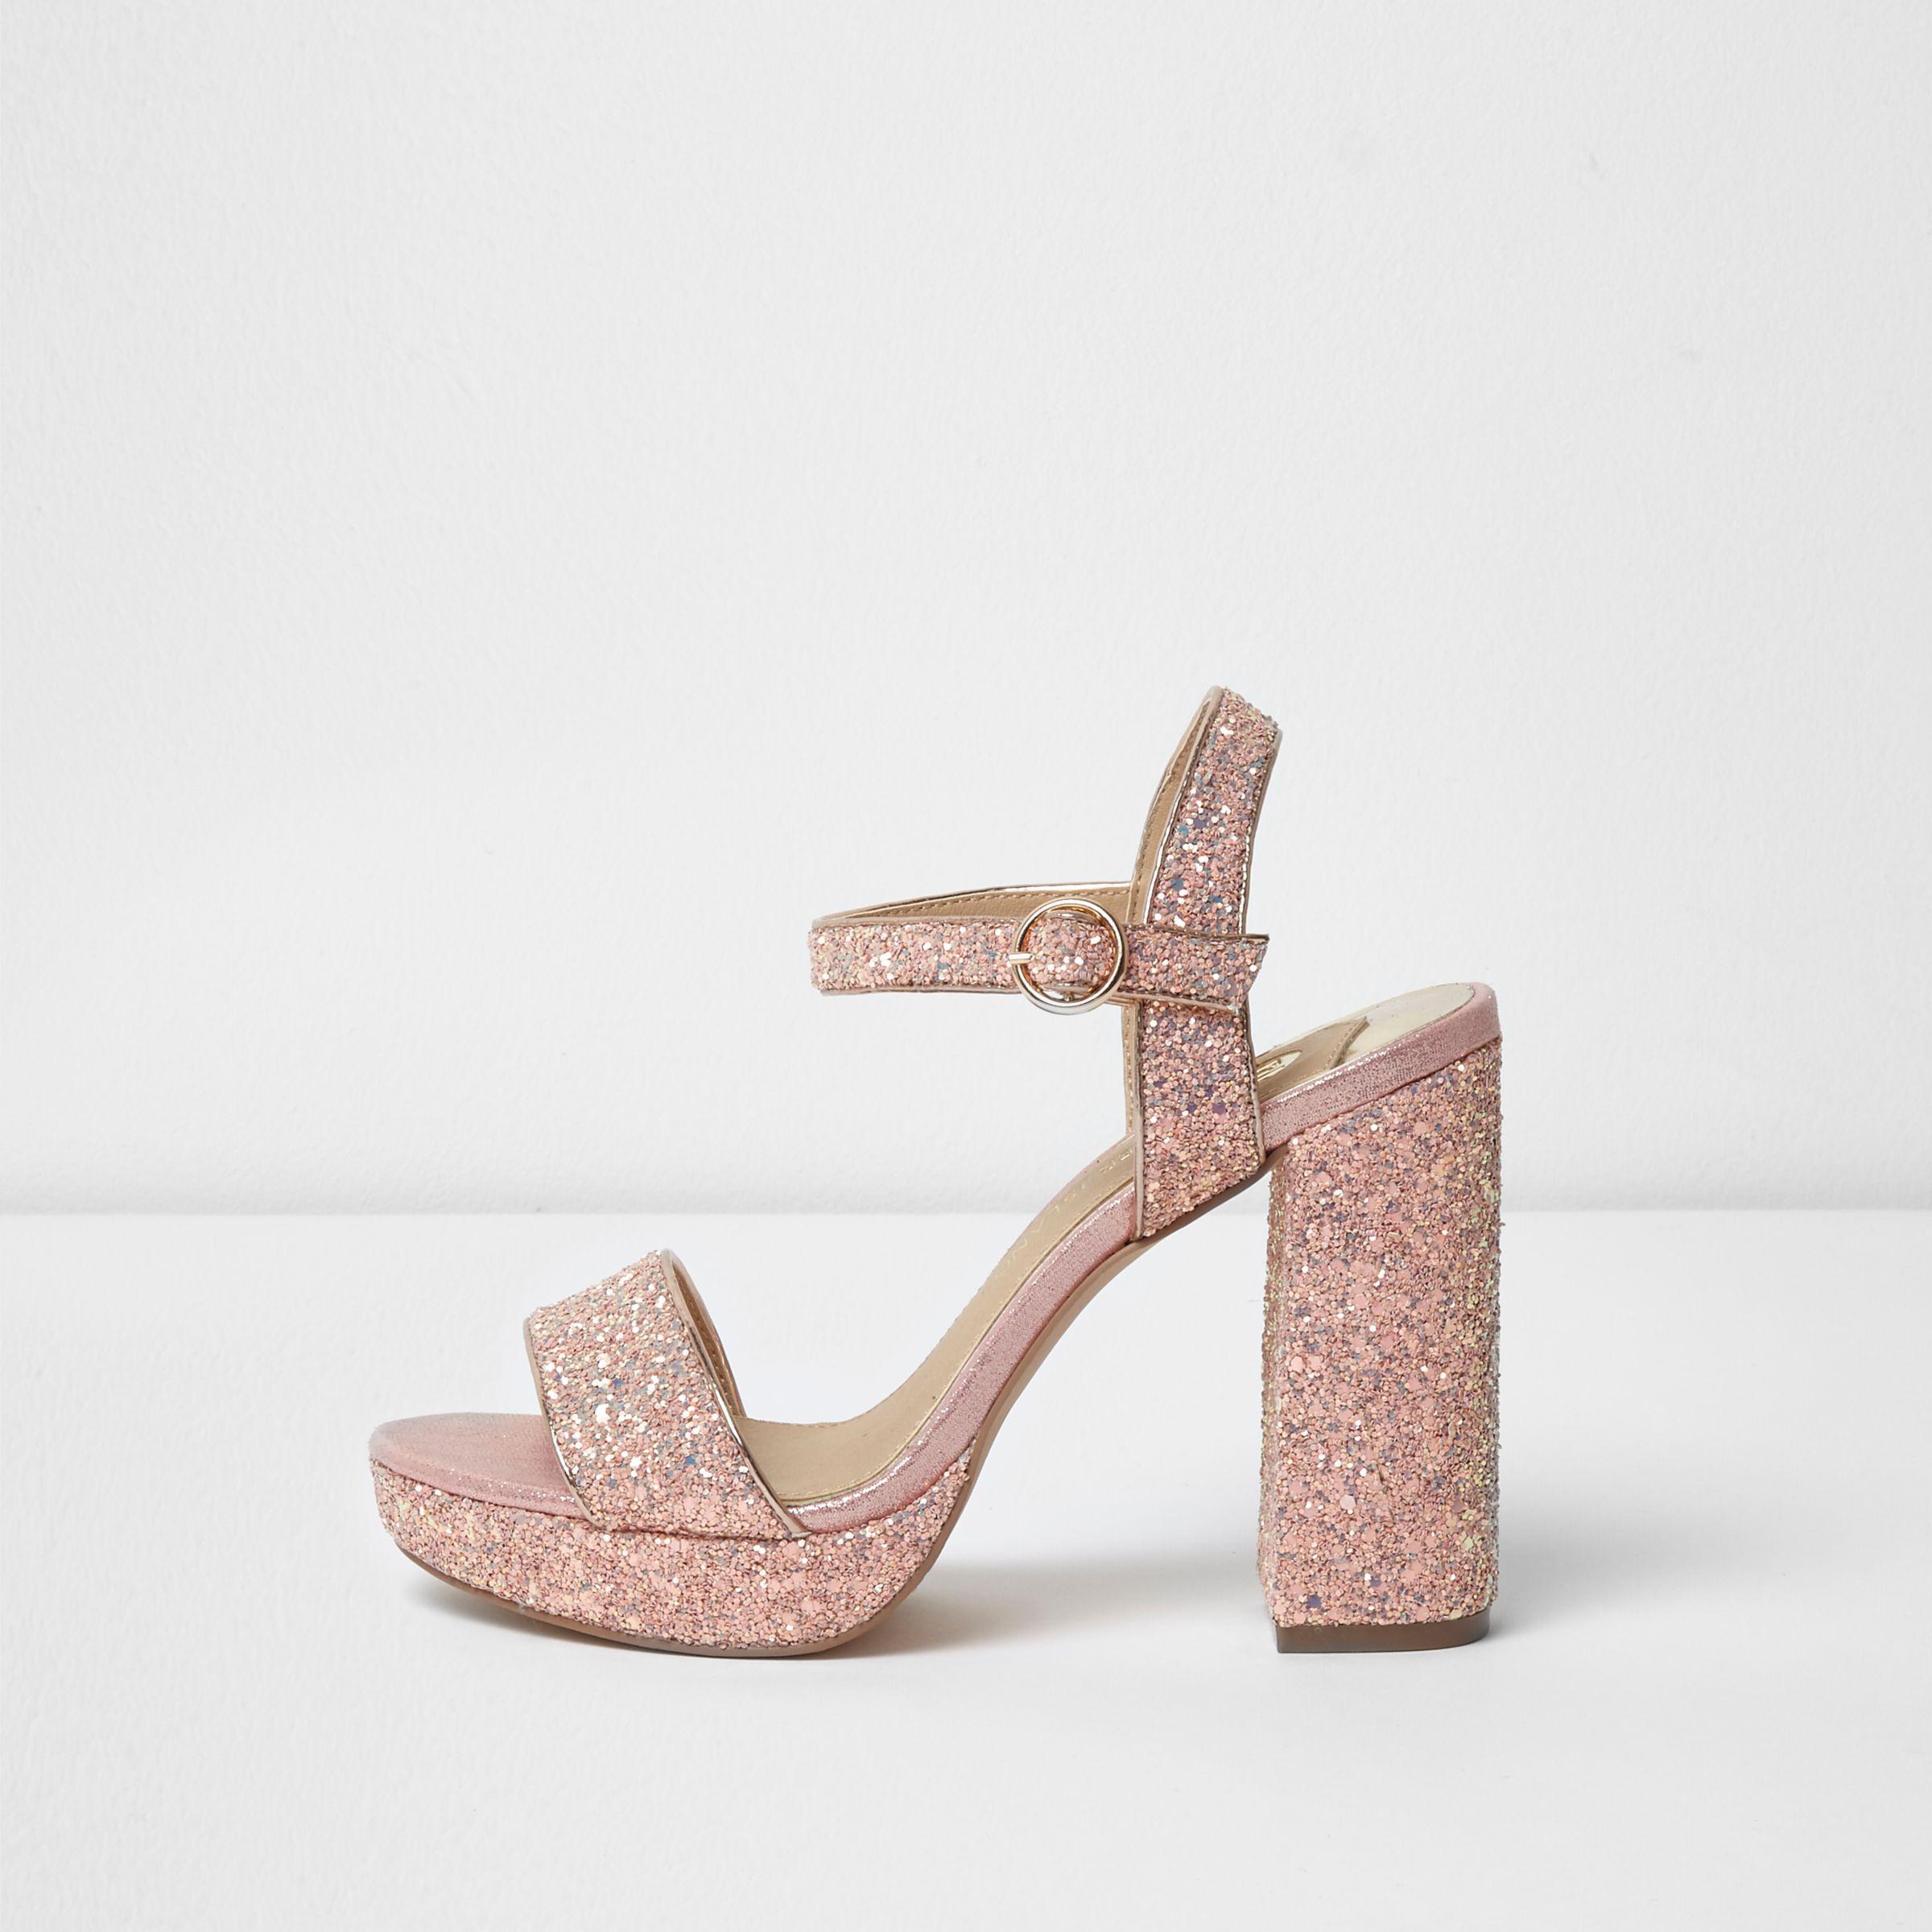 6d19057b9fd Lyst - River Island Pink Glitter Platform Block Heel Sandals in Pink